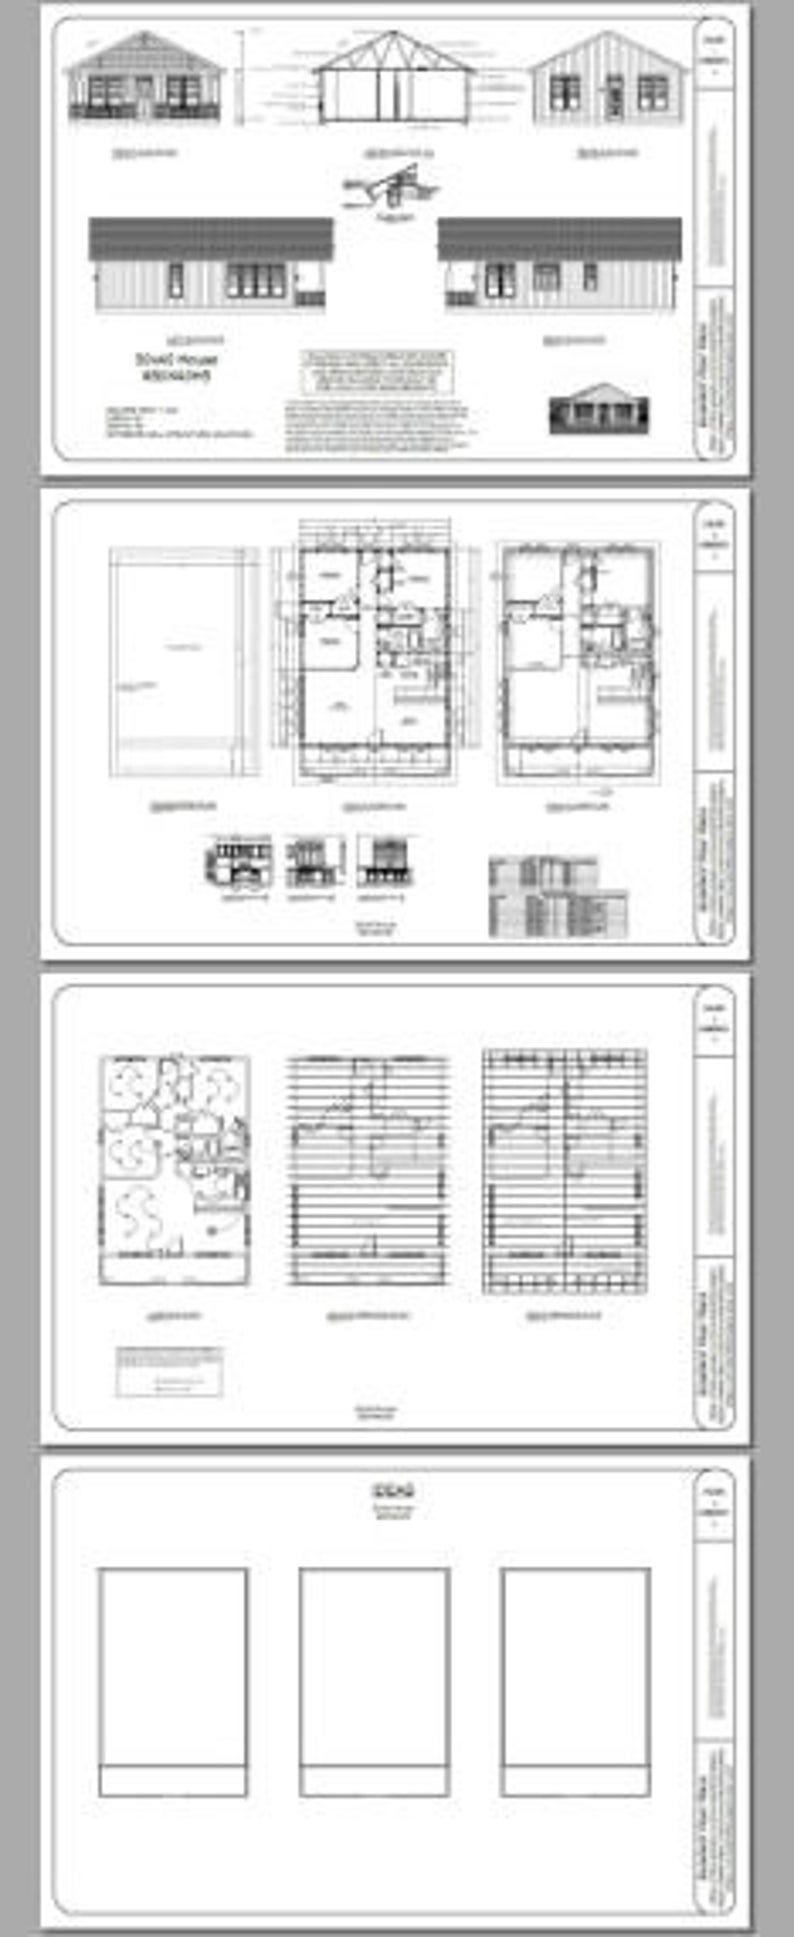 30x40 House 3 Bedroom 2 Bath 1 200 sq ft PDF Floor Plan Instant Download Model 3